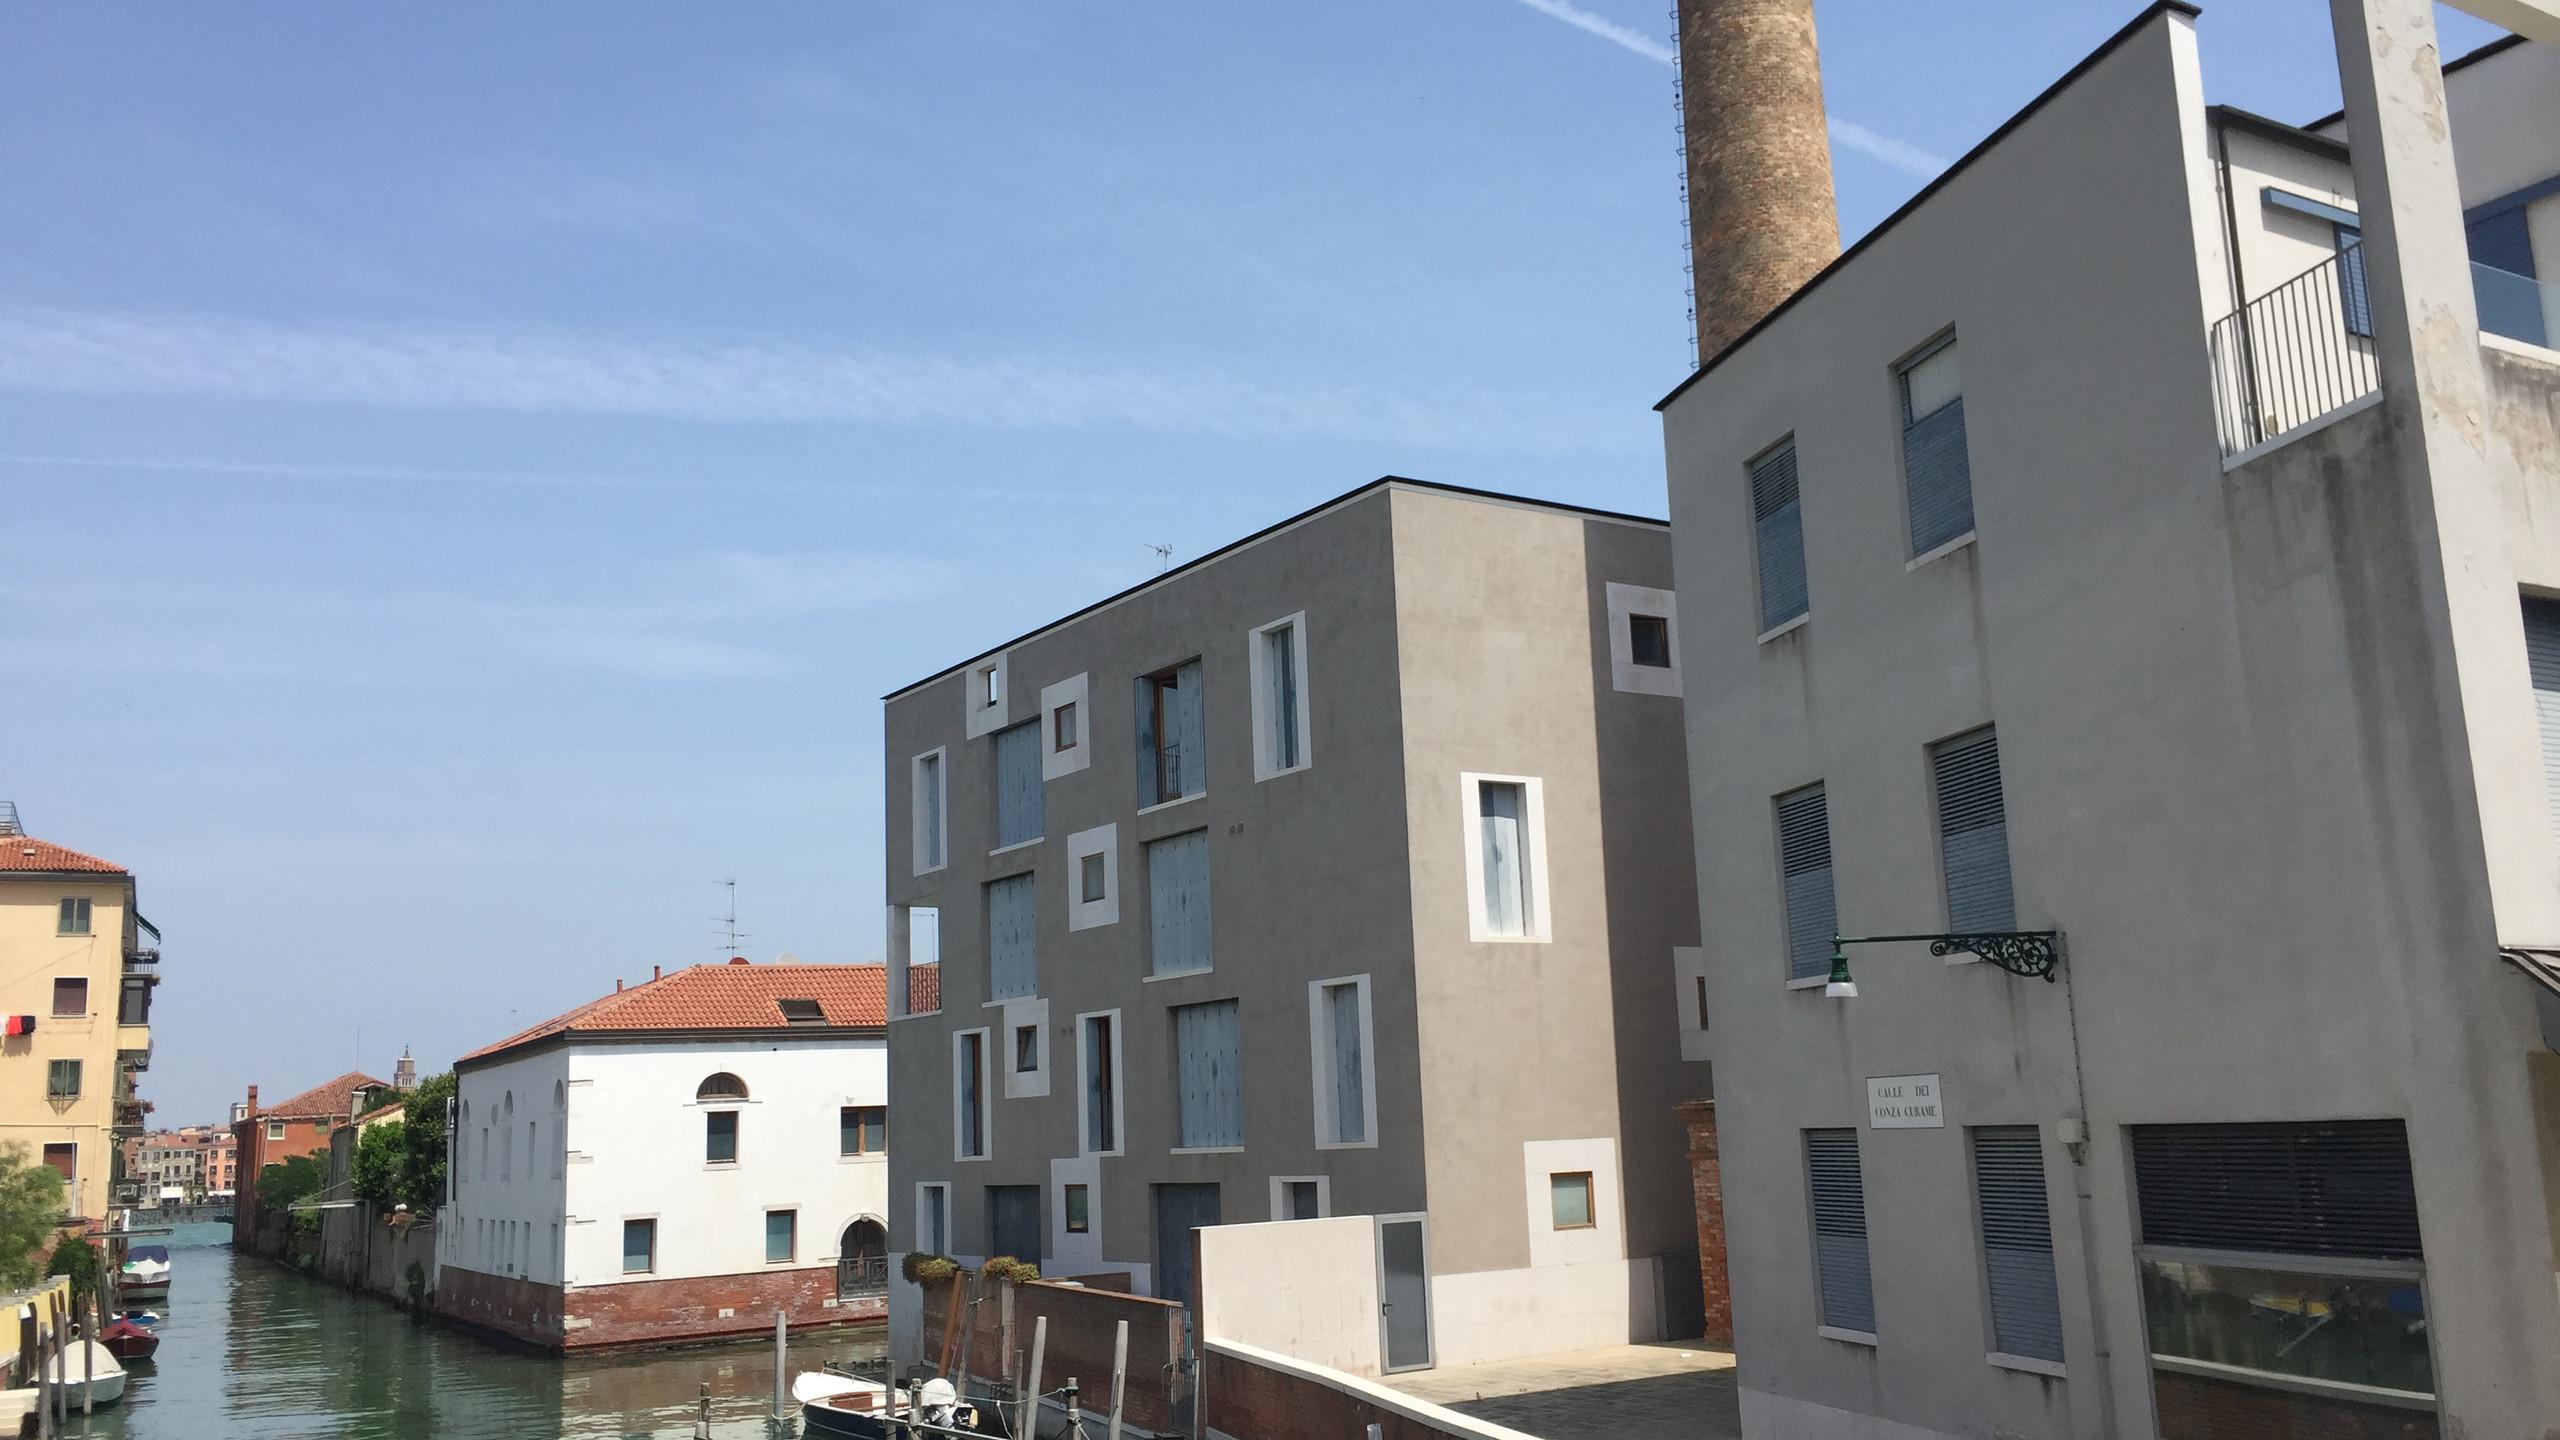 Cino Zucchi, Junghans Areal, Giudecca